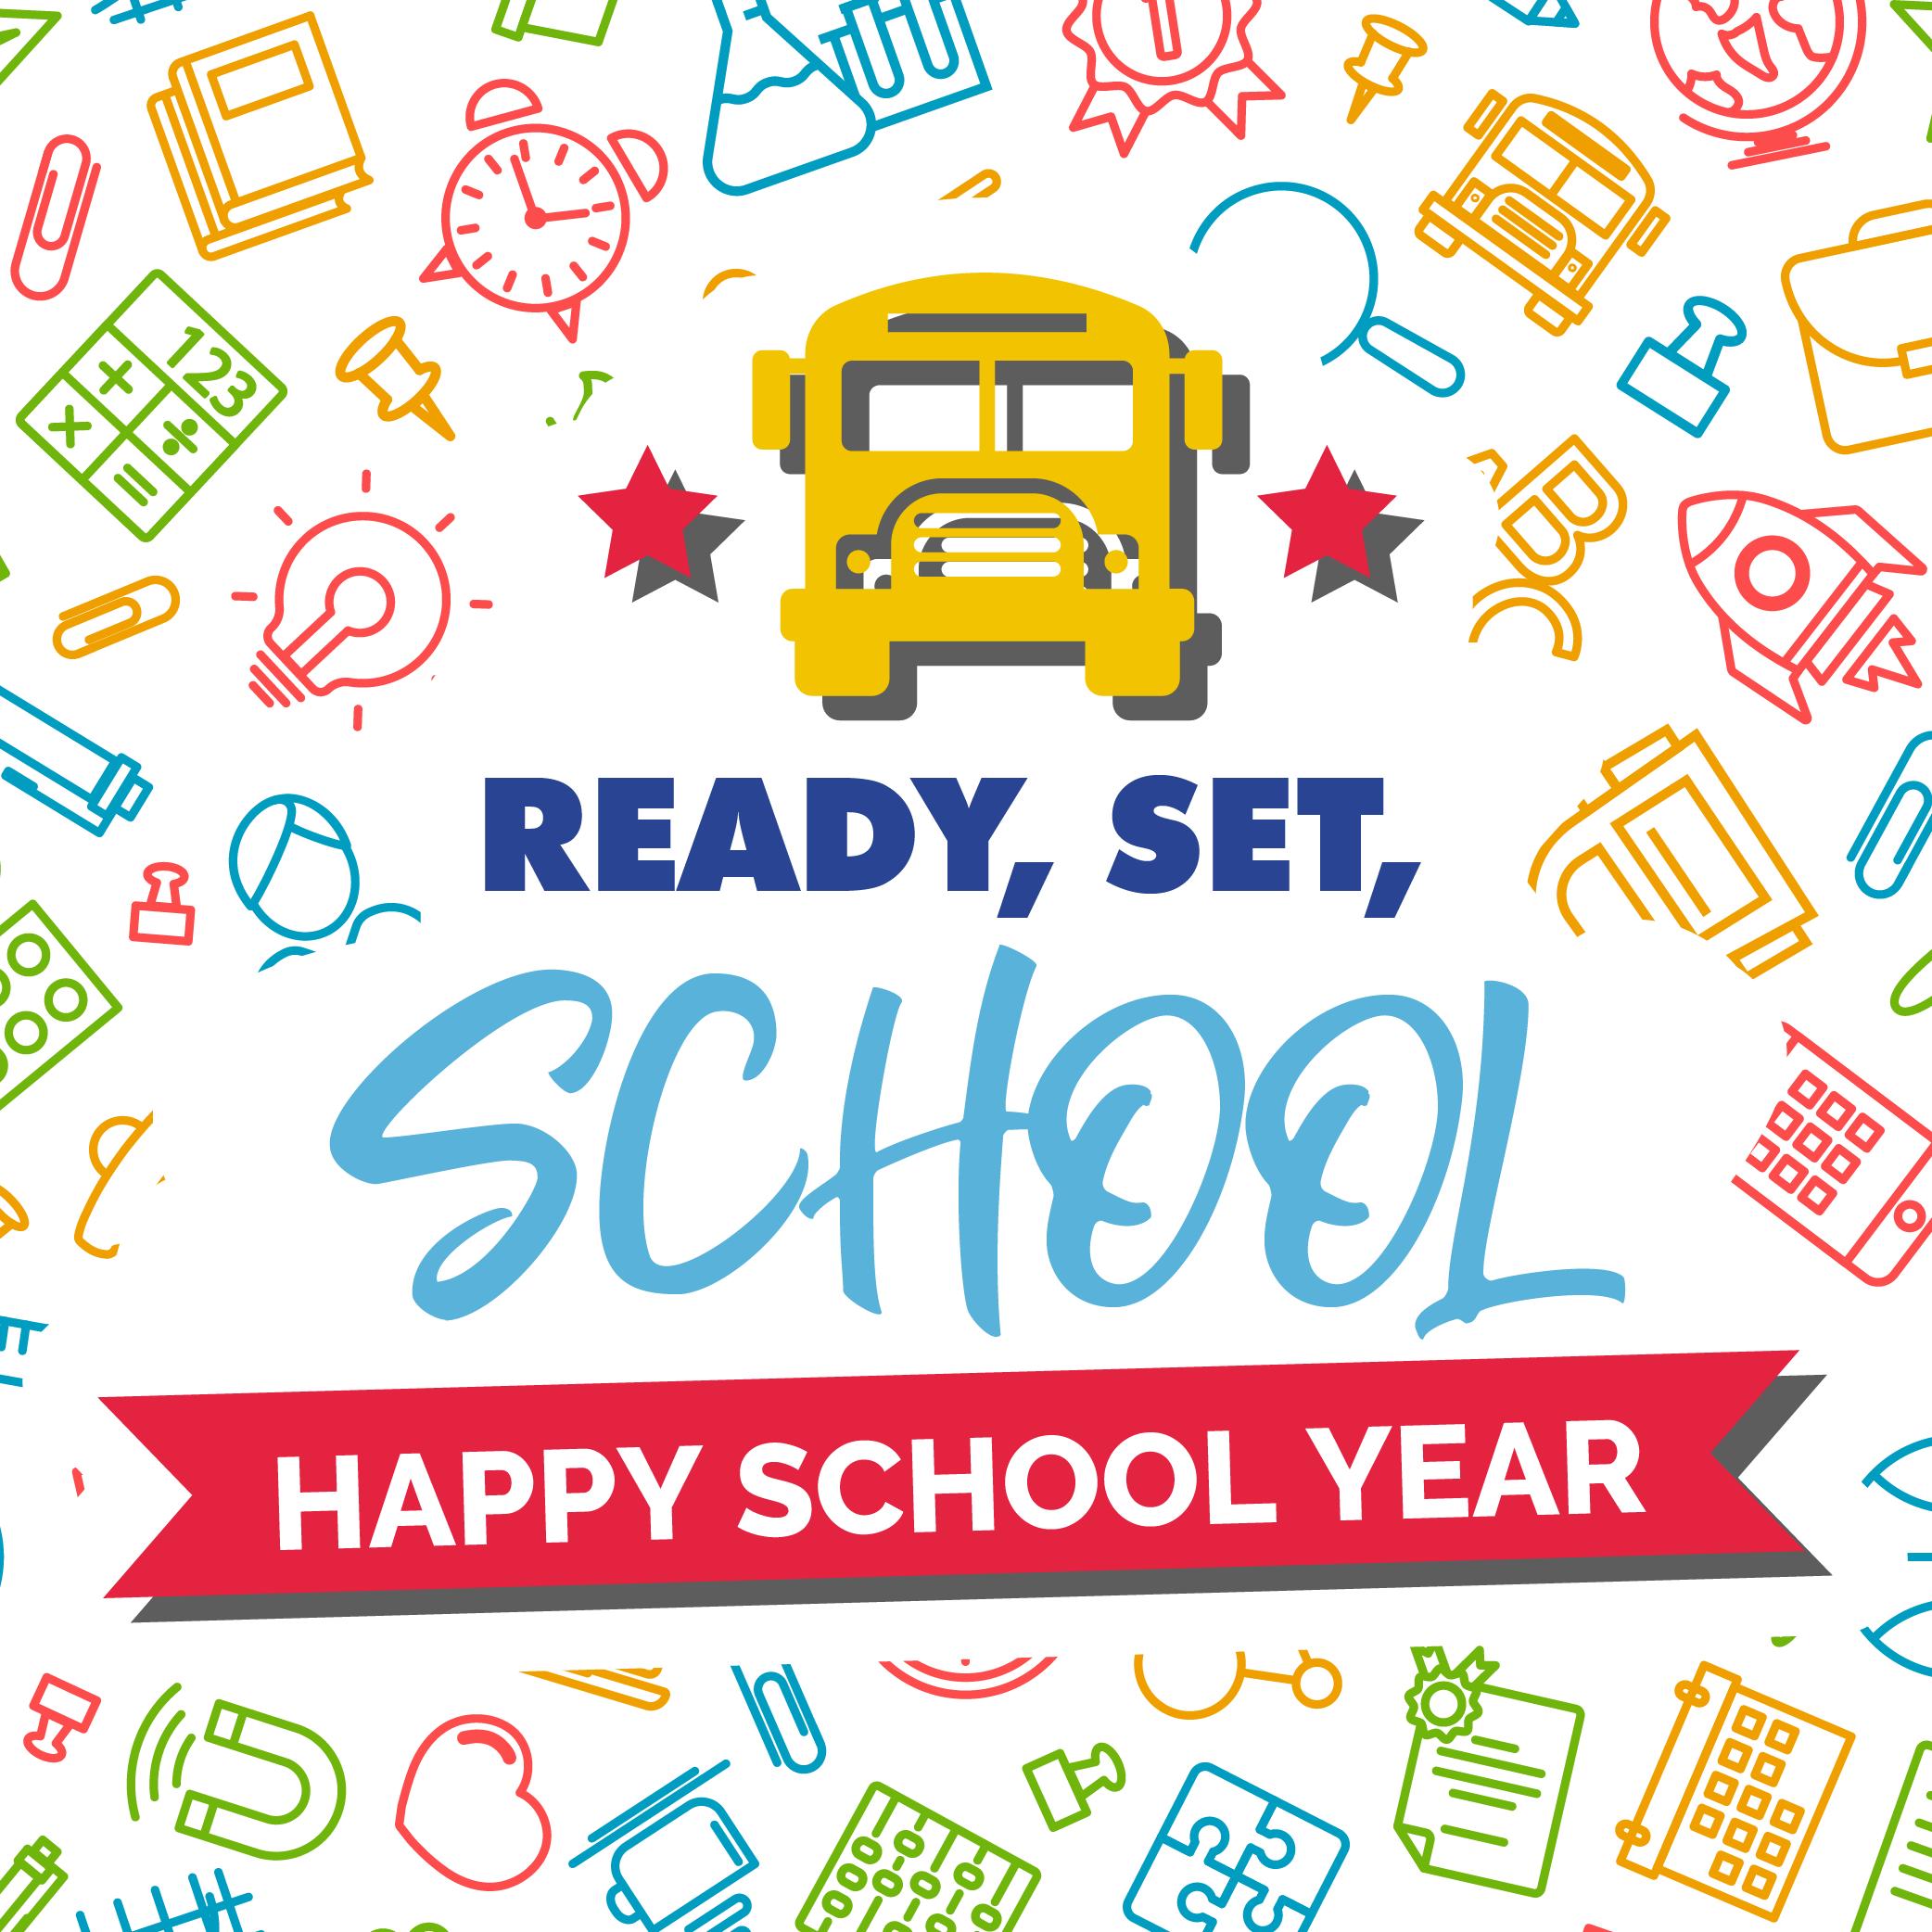 Ready, Set, School!